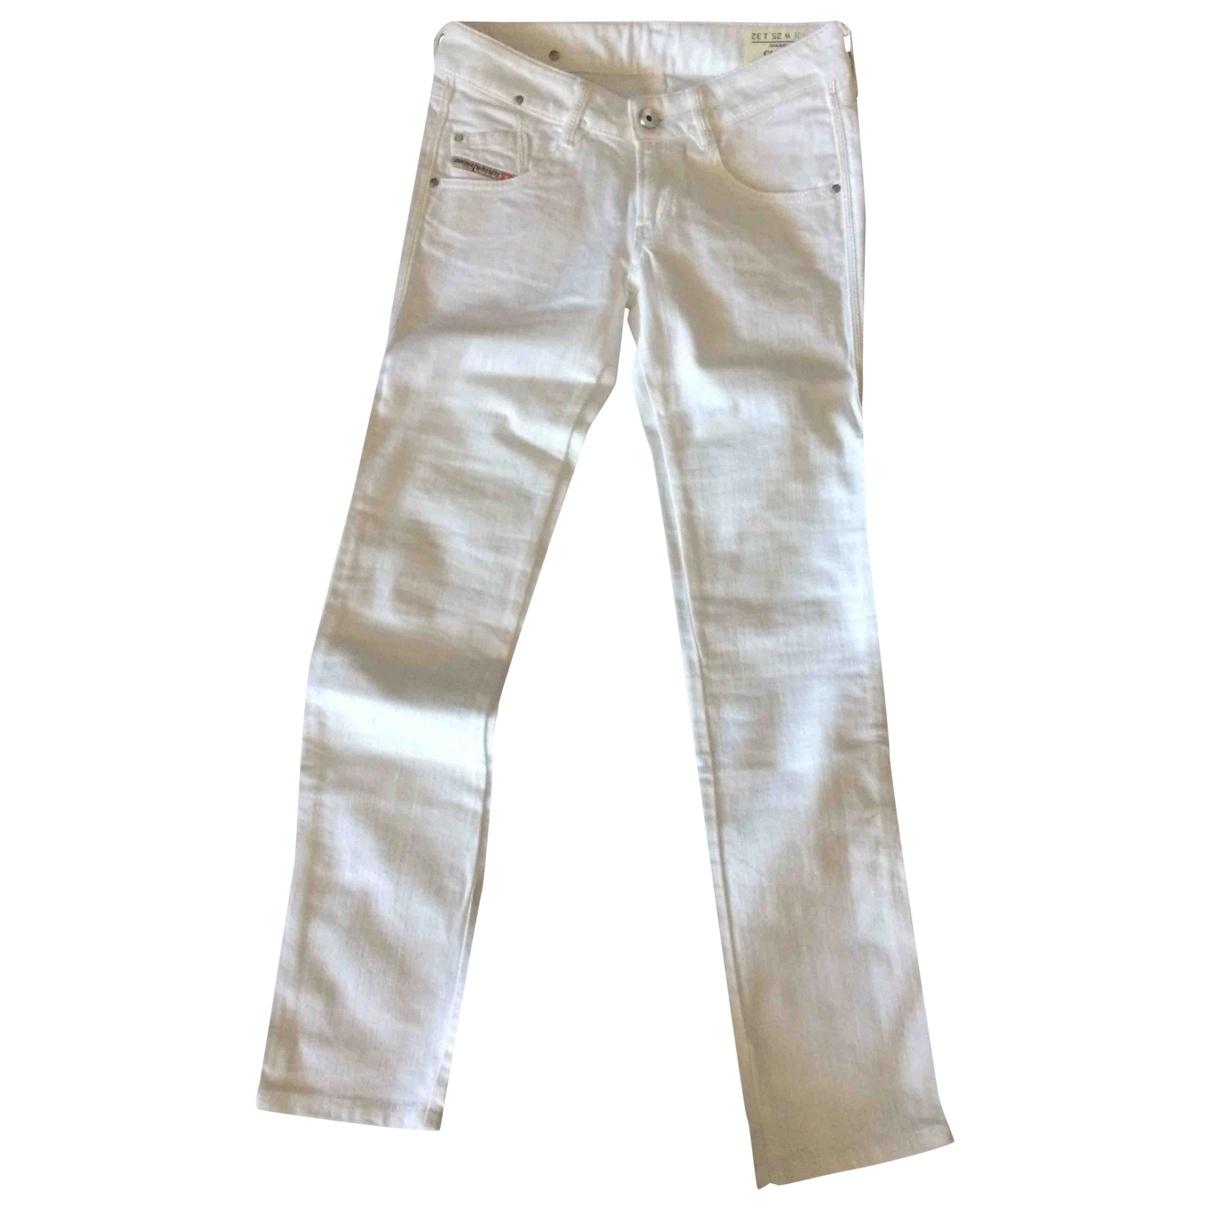 Diesel \N Ecru Cotton - elasthane Jeans for Women 34 FR